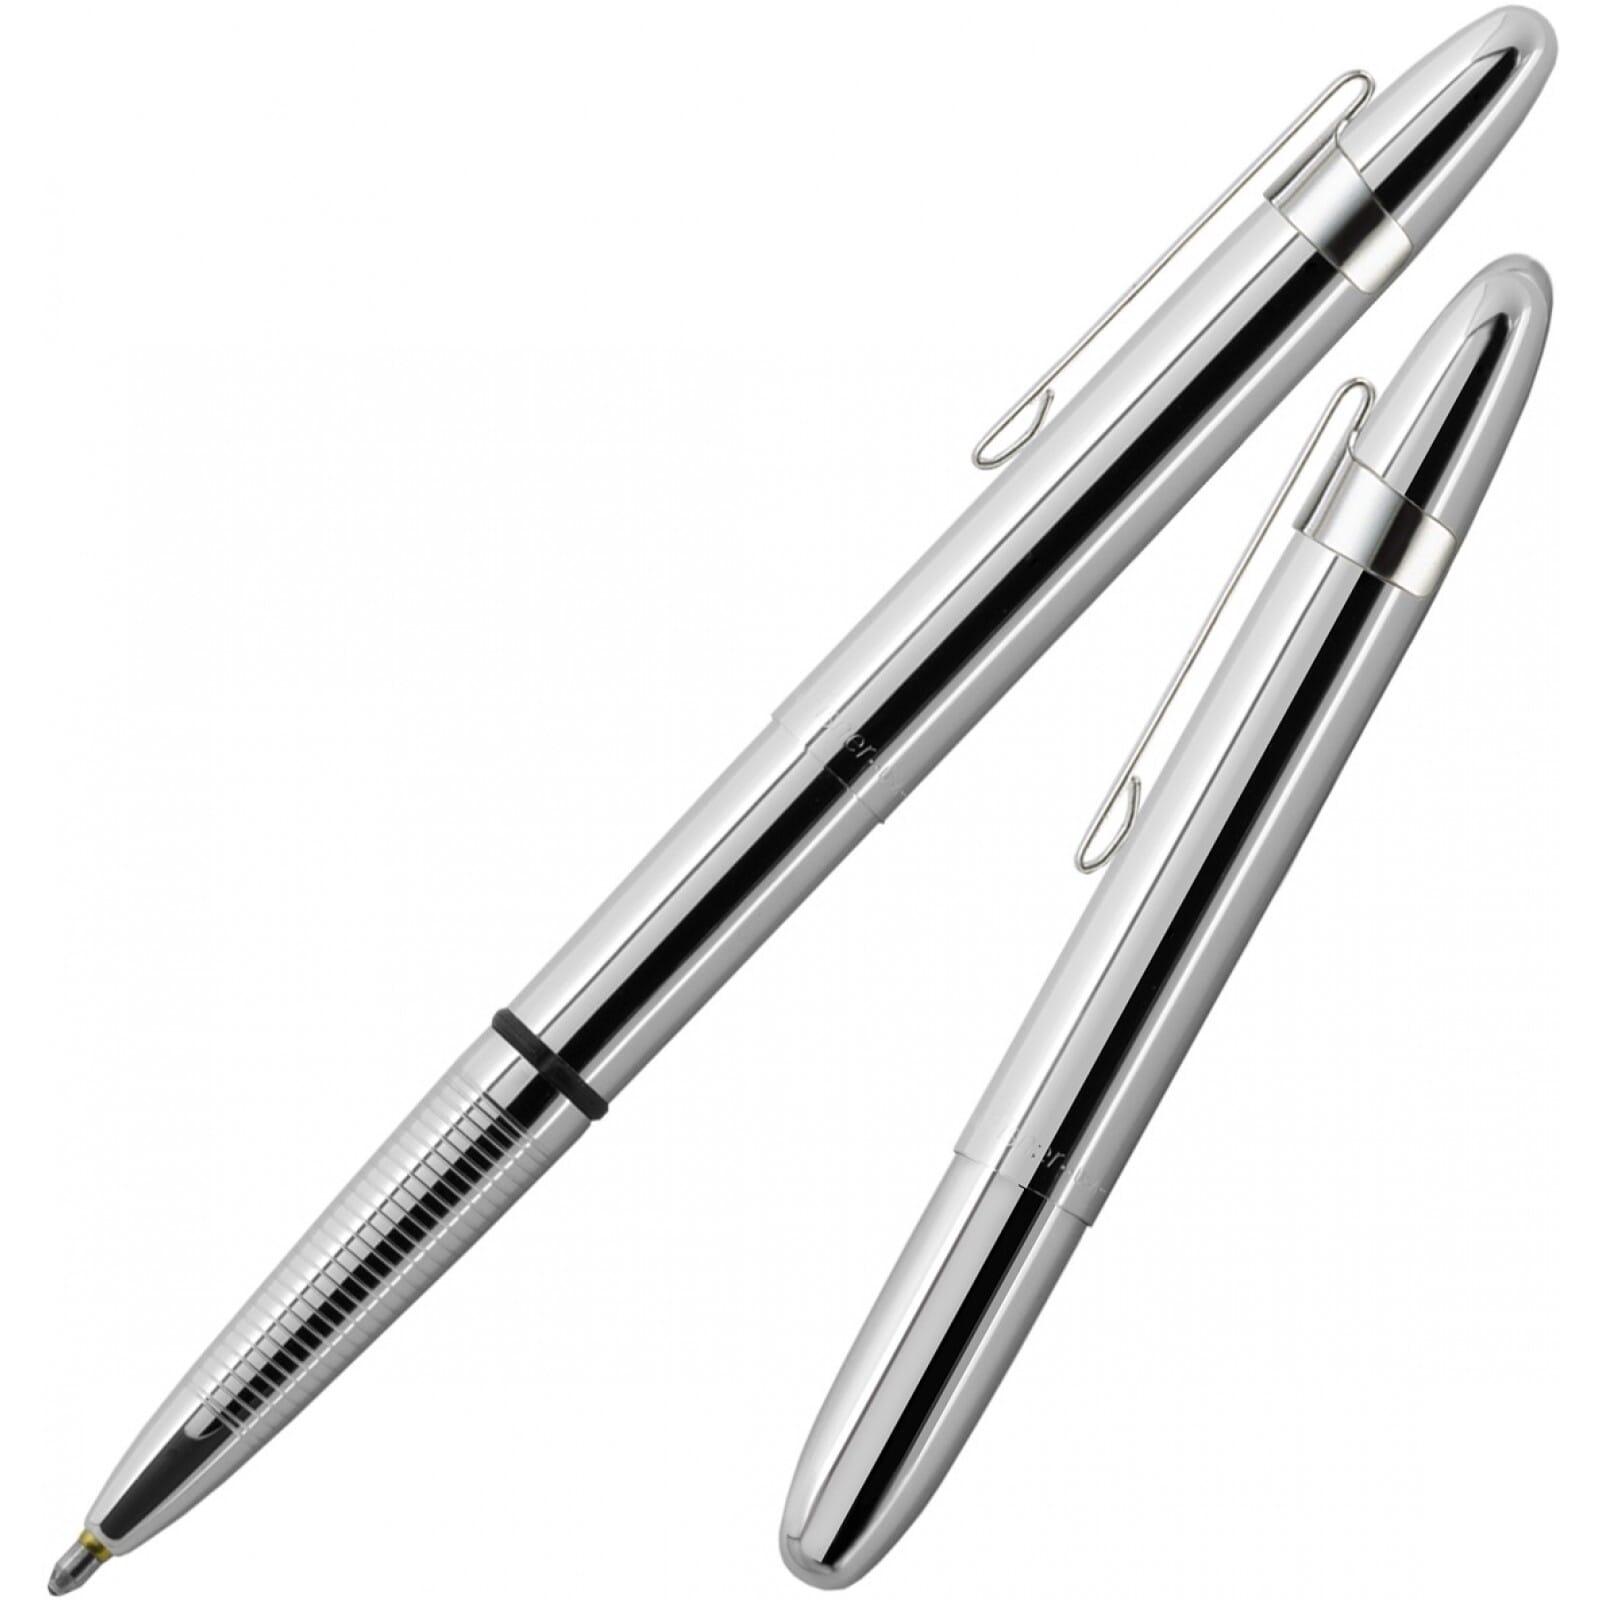 Fisher Space Pen Bullet Style Chrome Pressurized Black Ink Medium Point